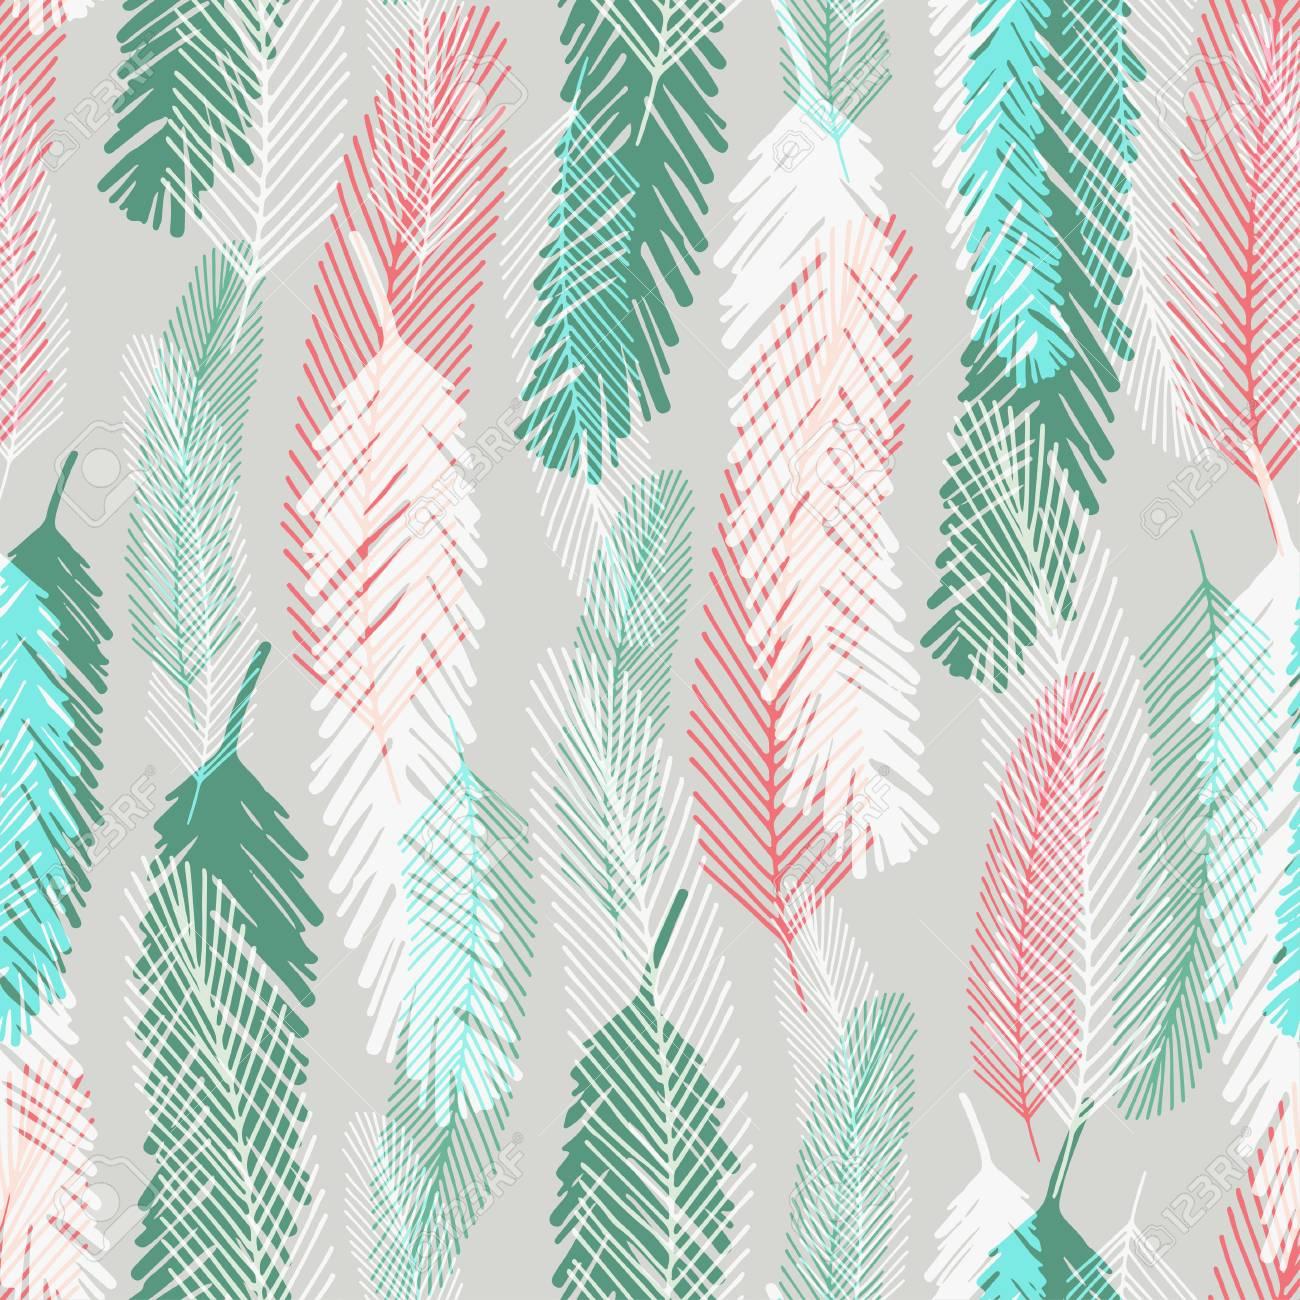 Patrón Sin Costuras De Moda Con Plumas De Colores. Vector Textura ...